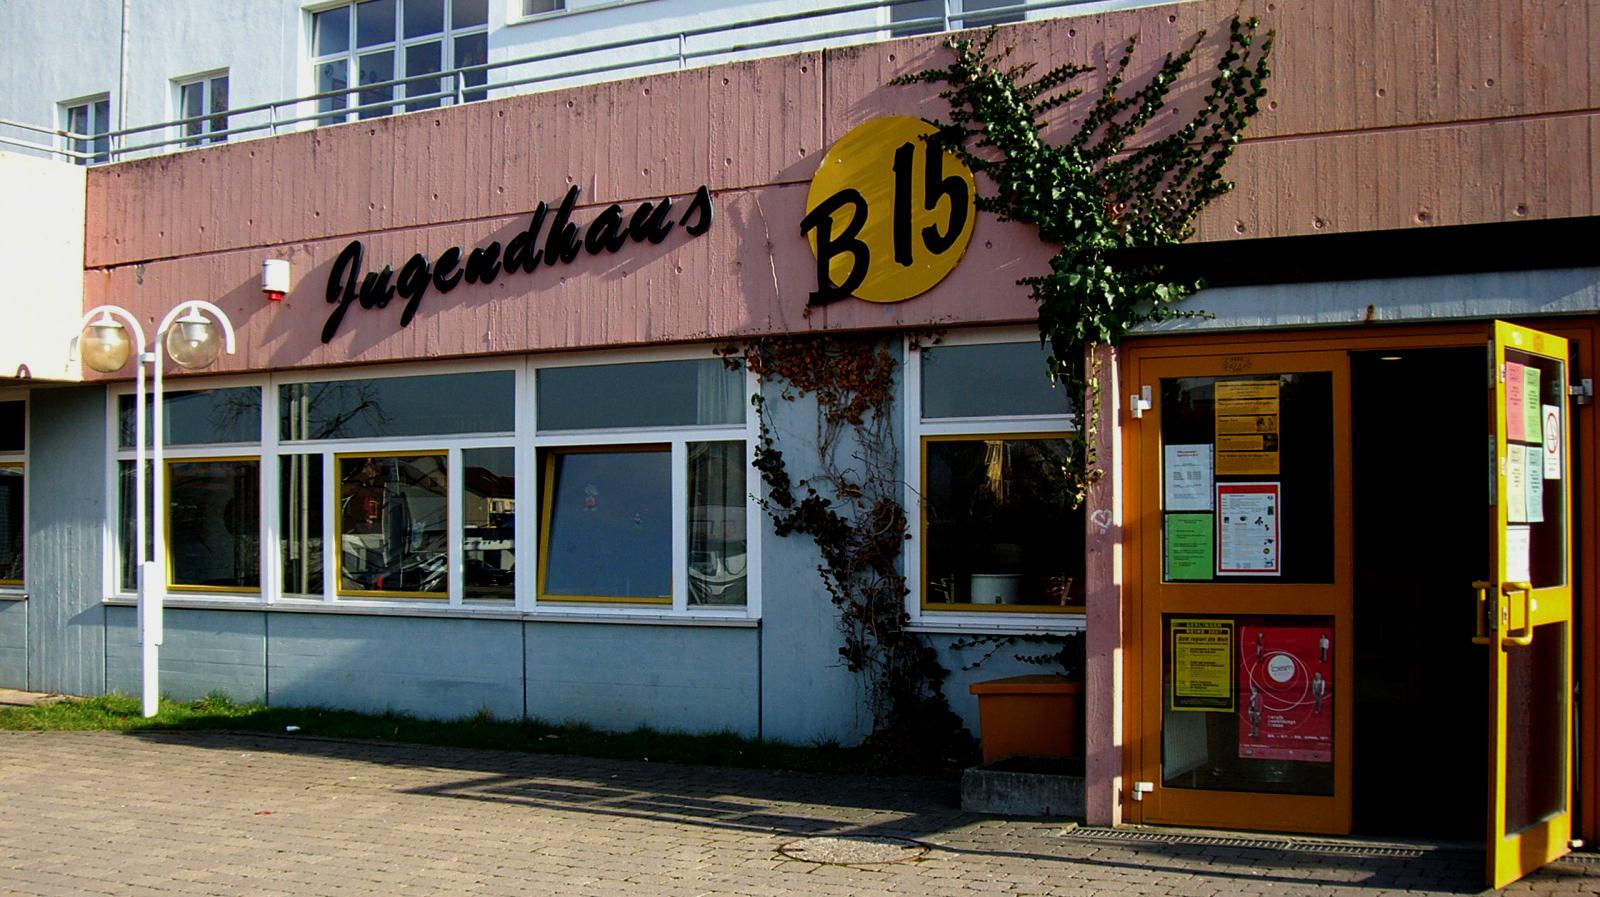 Jugendhaus B15 Gerlingen